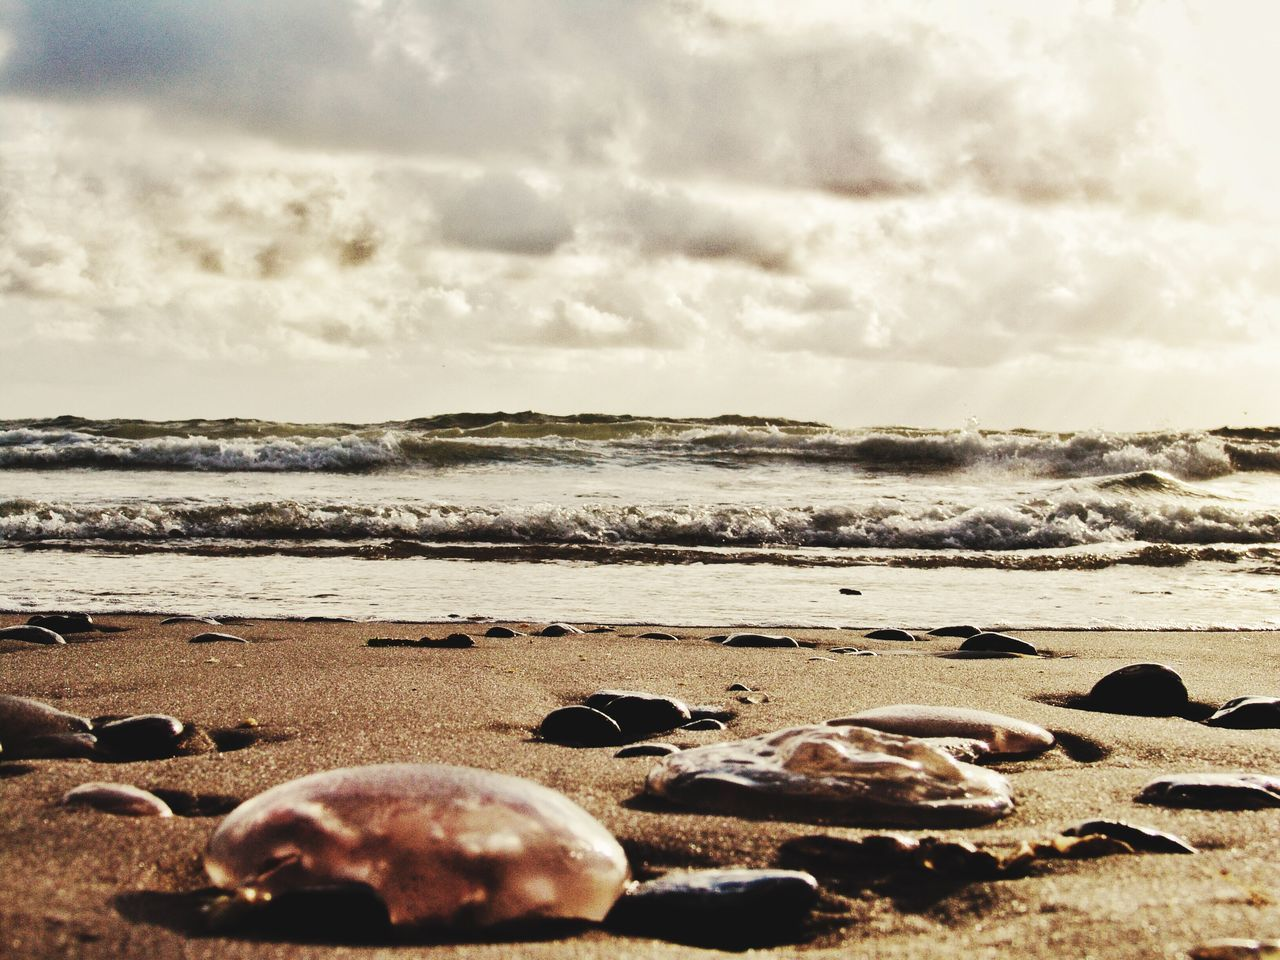 Hollidays Urlaub Strand Meer Sea Nordsee Northsea Danmark Summer Summertime Sommer Quallen Sand Showcase July